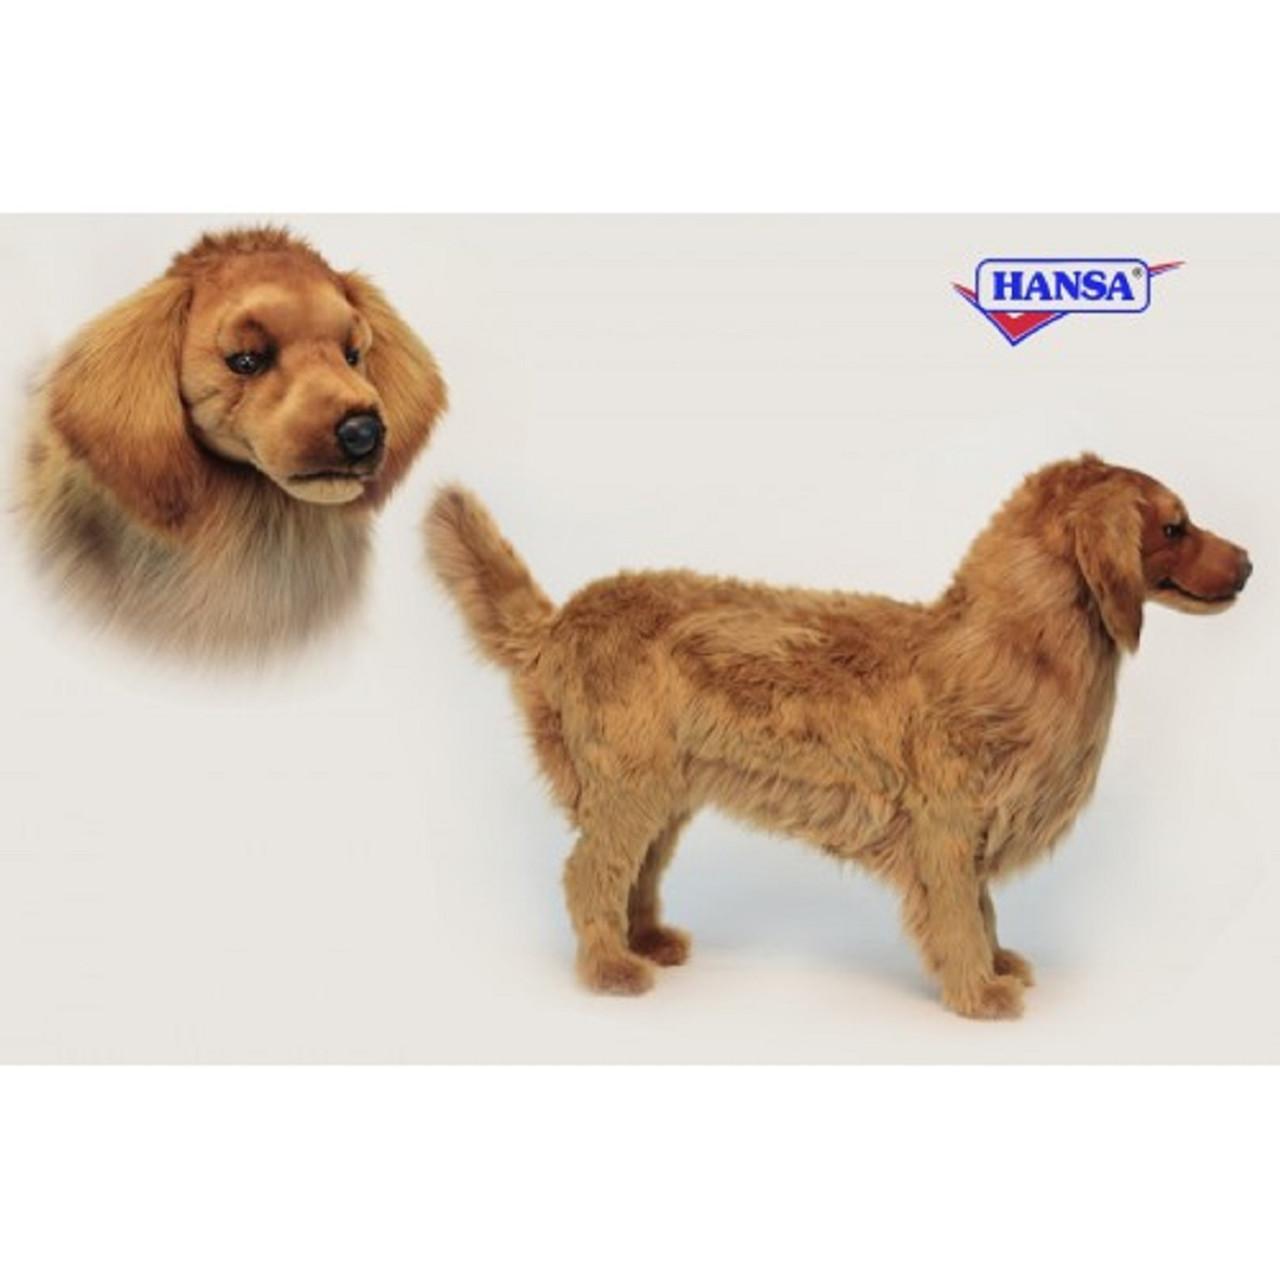 Life Like Handcrafted Extra Soft Plush Life Size Golden Retriever Stool Stuffed Animal 35 31069139